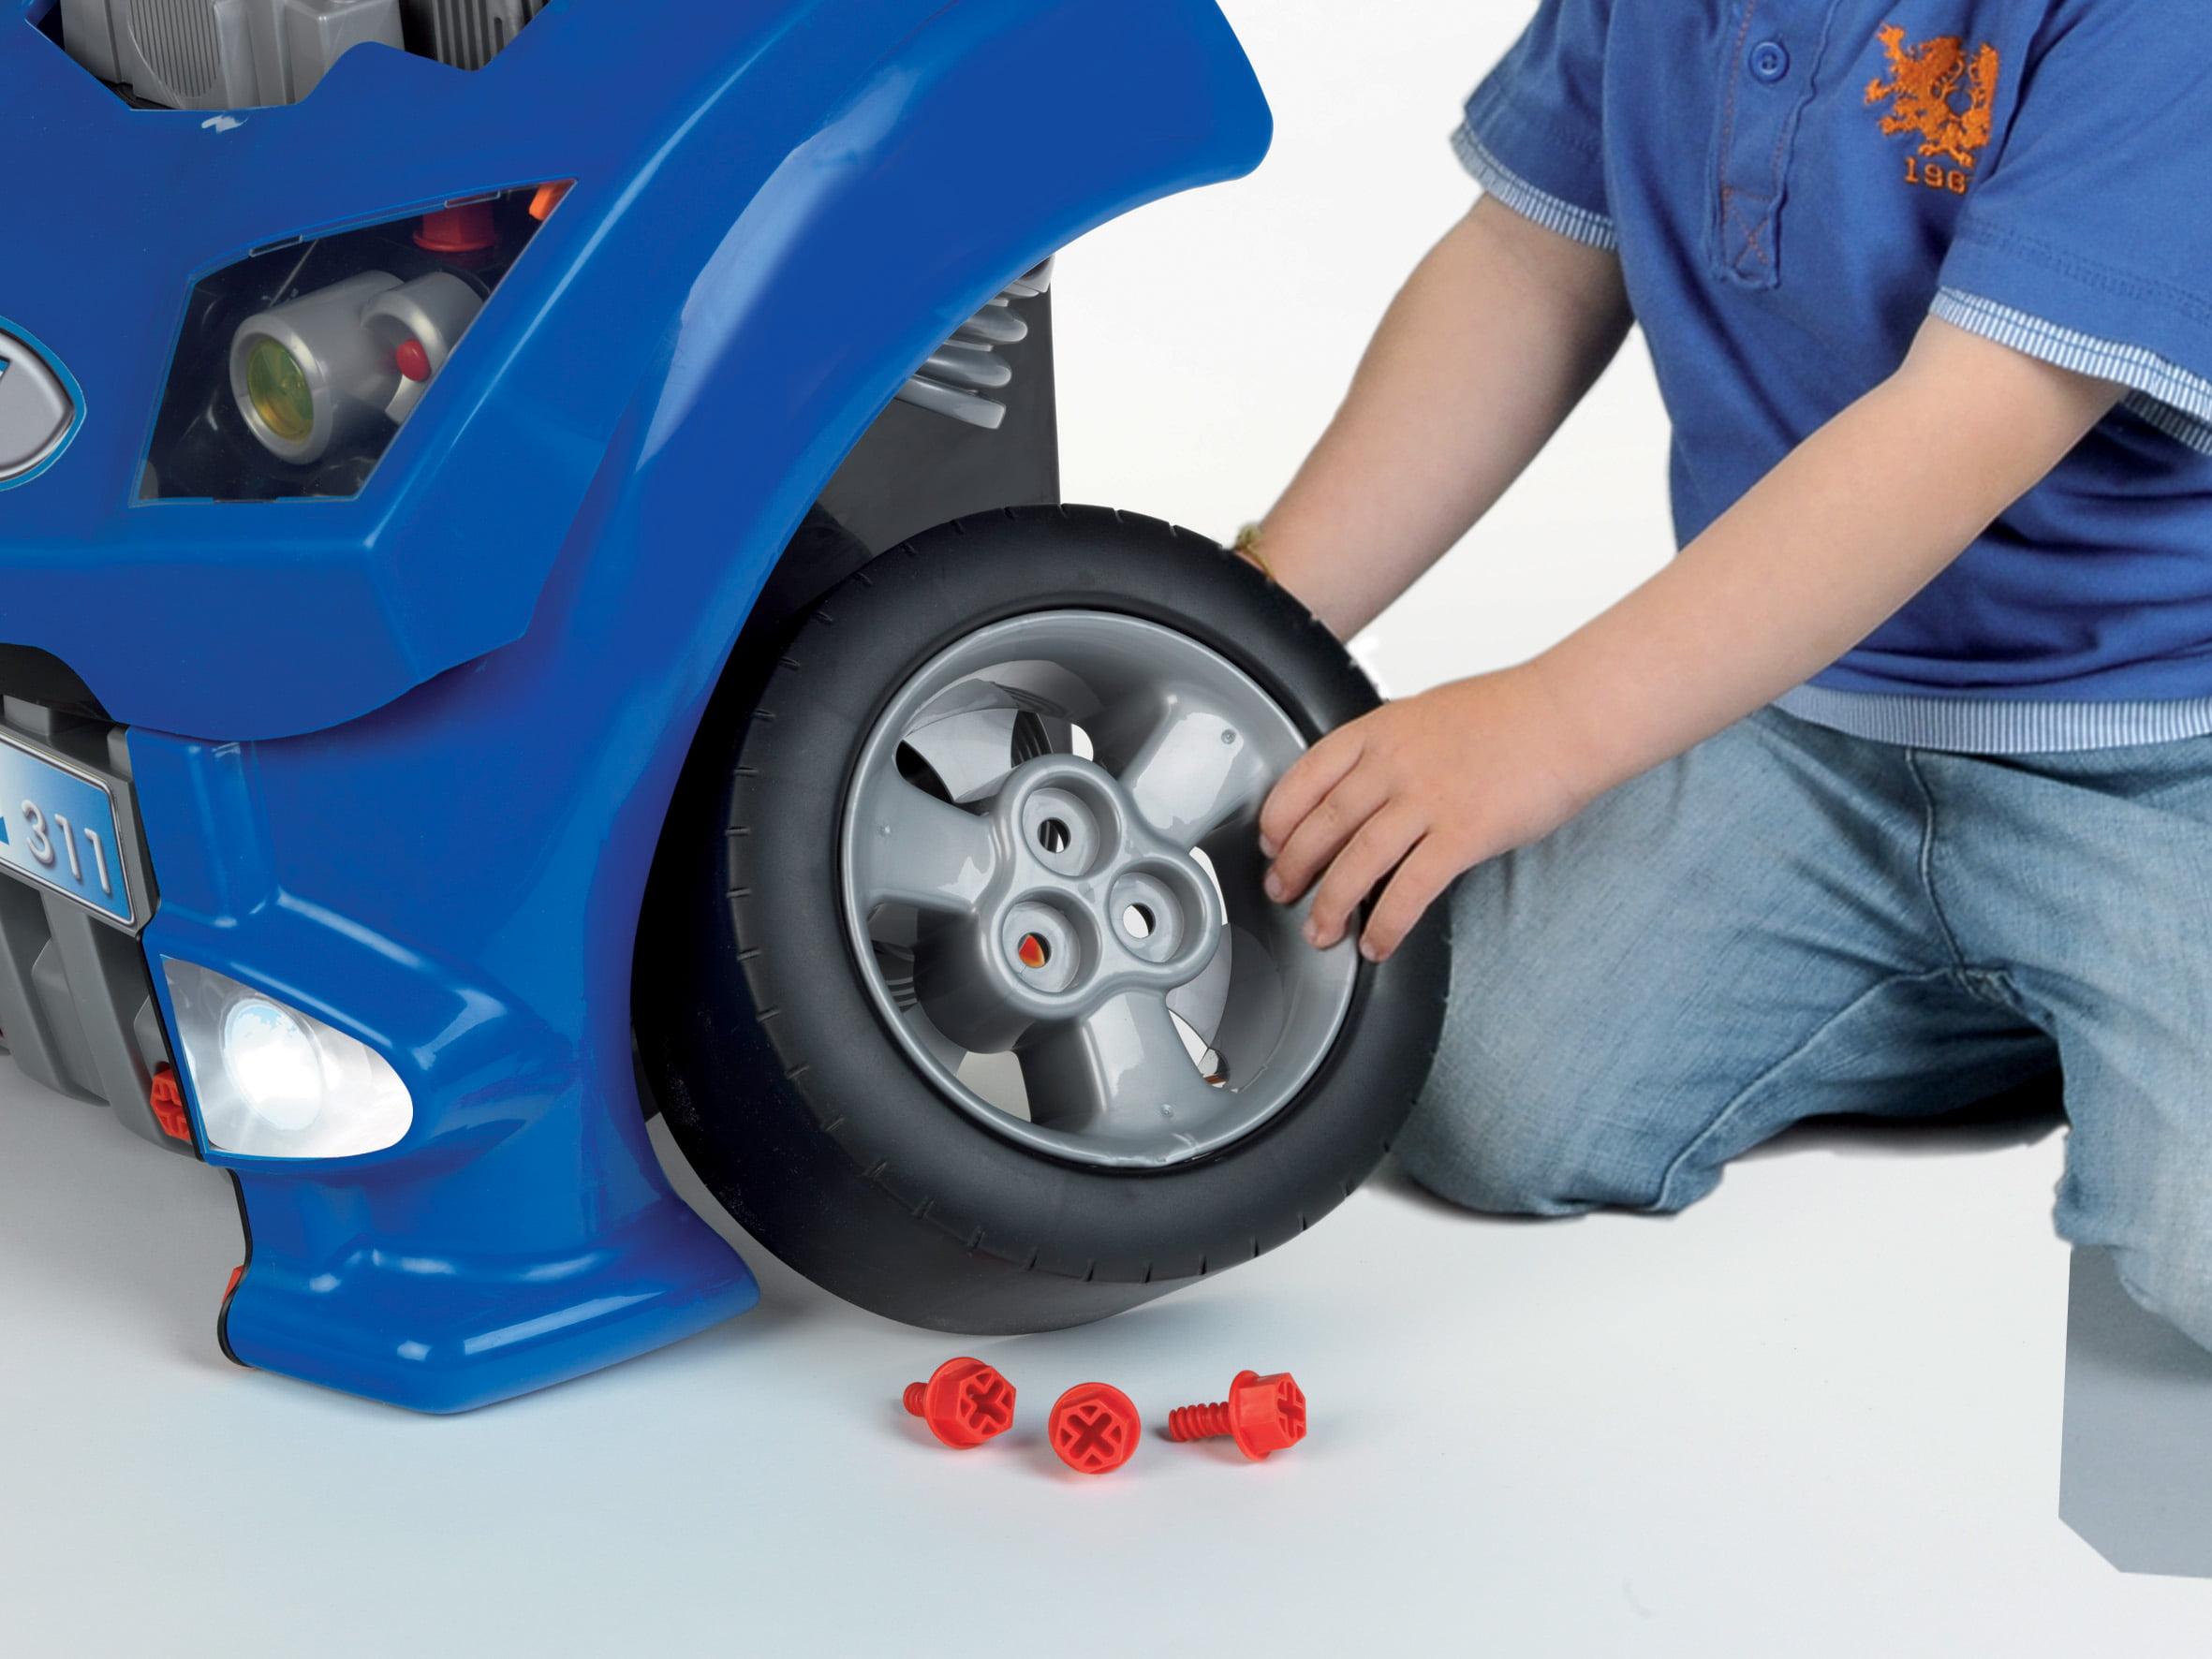 Theo Klein Hot Wheels Interactive Service Car Station Engine Playset Walmart Com Walmart Com